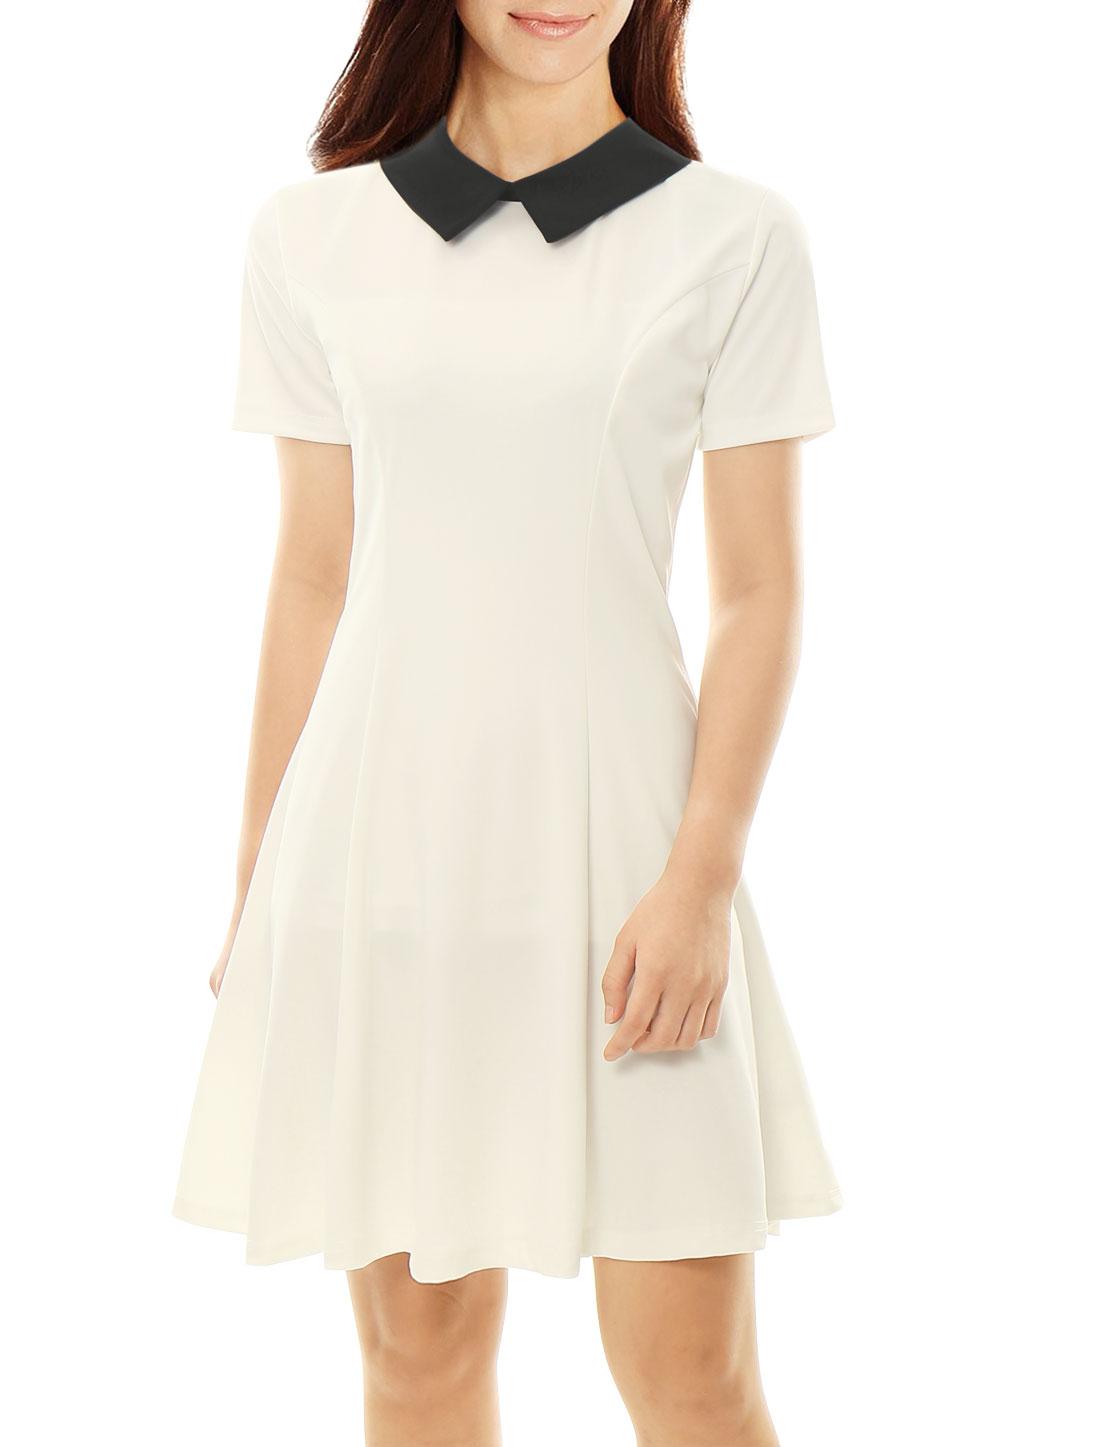 Women Contrast Doll Collar Short Sleeves Flare Dress White M